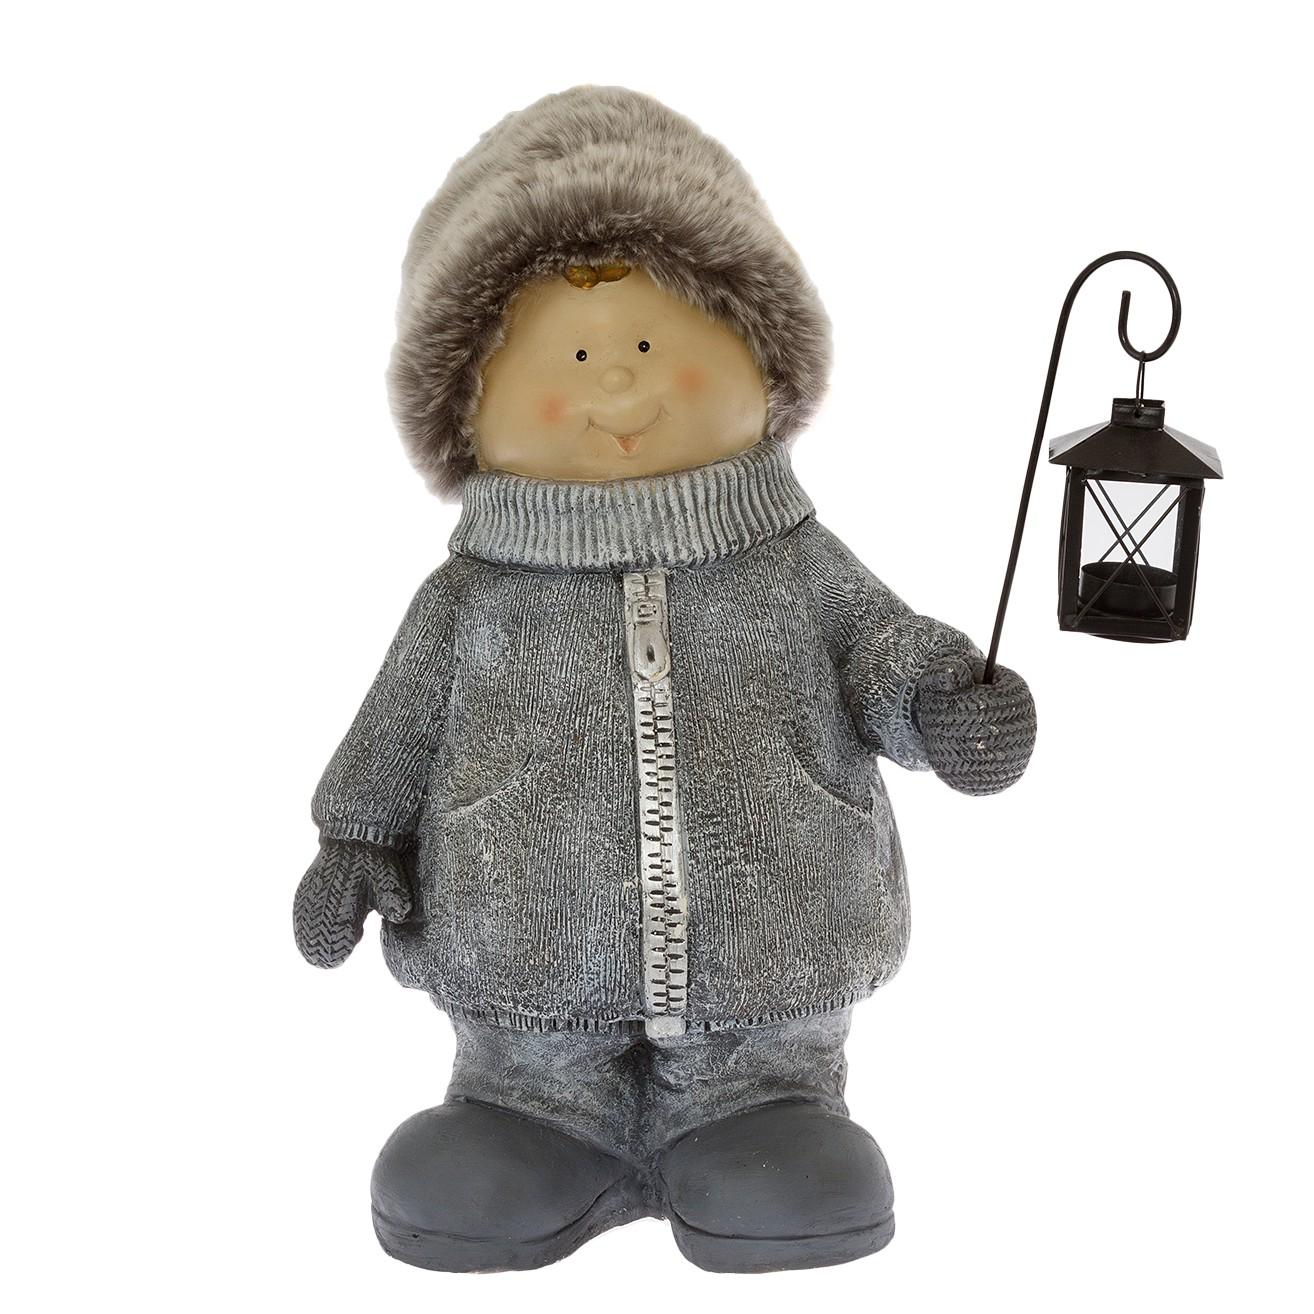 home24 Dekofigur Winterkind Junge | Dekoration > Figuren und Skulpturen | Grau | Kunststoff | My Flair